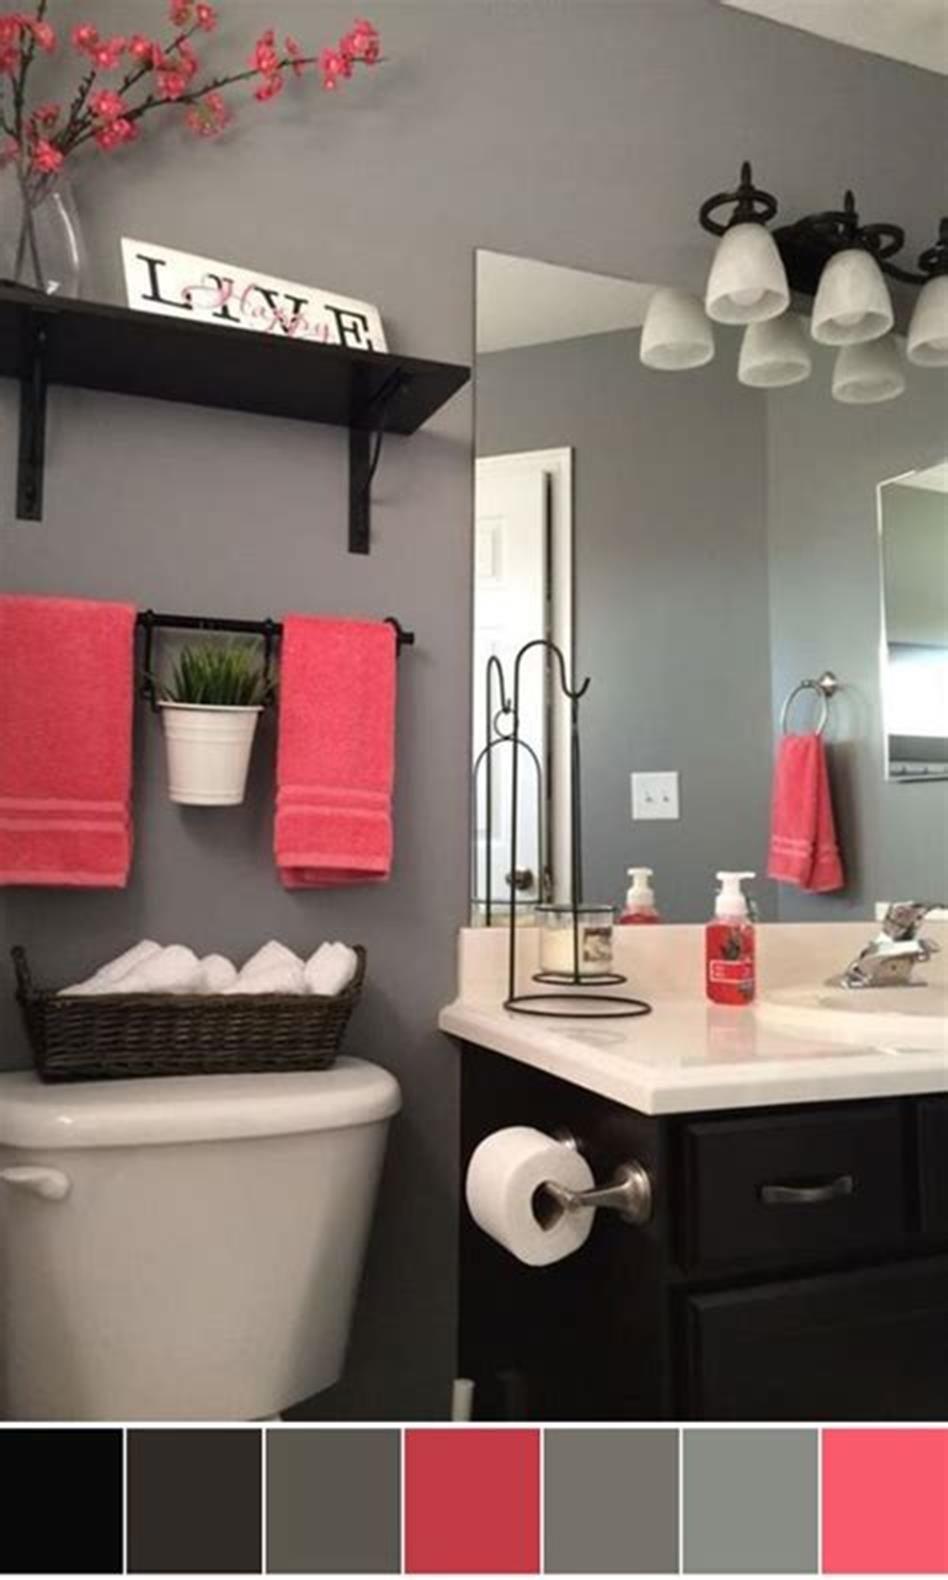 Photo of 40 Best Color Schemes Bathroom Decorating Ideas on a Budget 2019 31 – ViraLinspi…